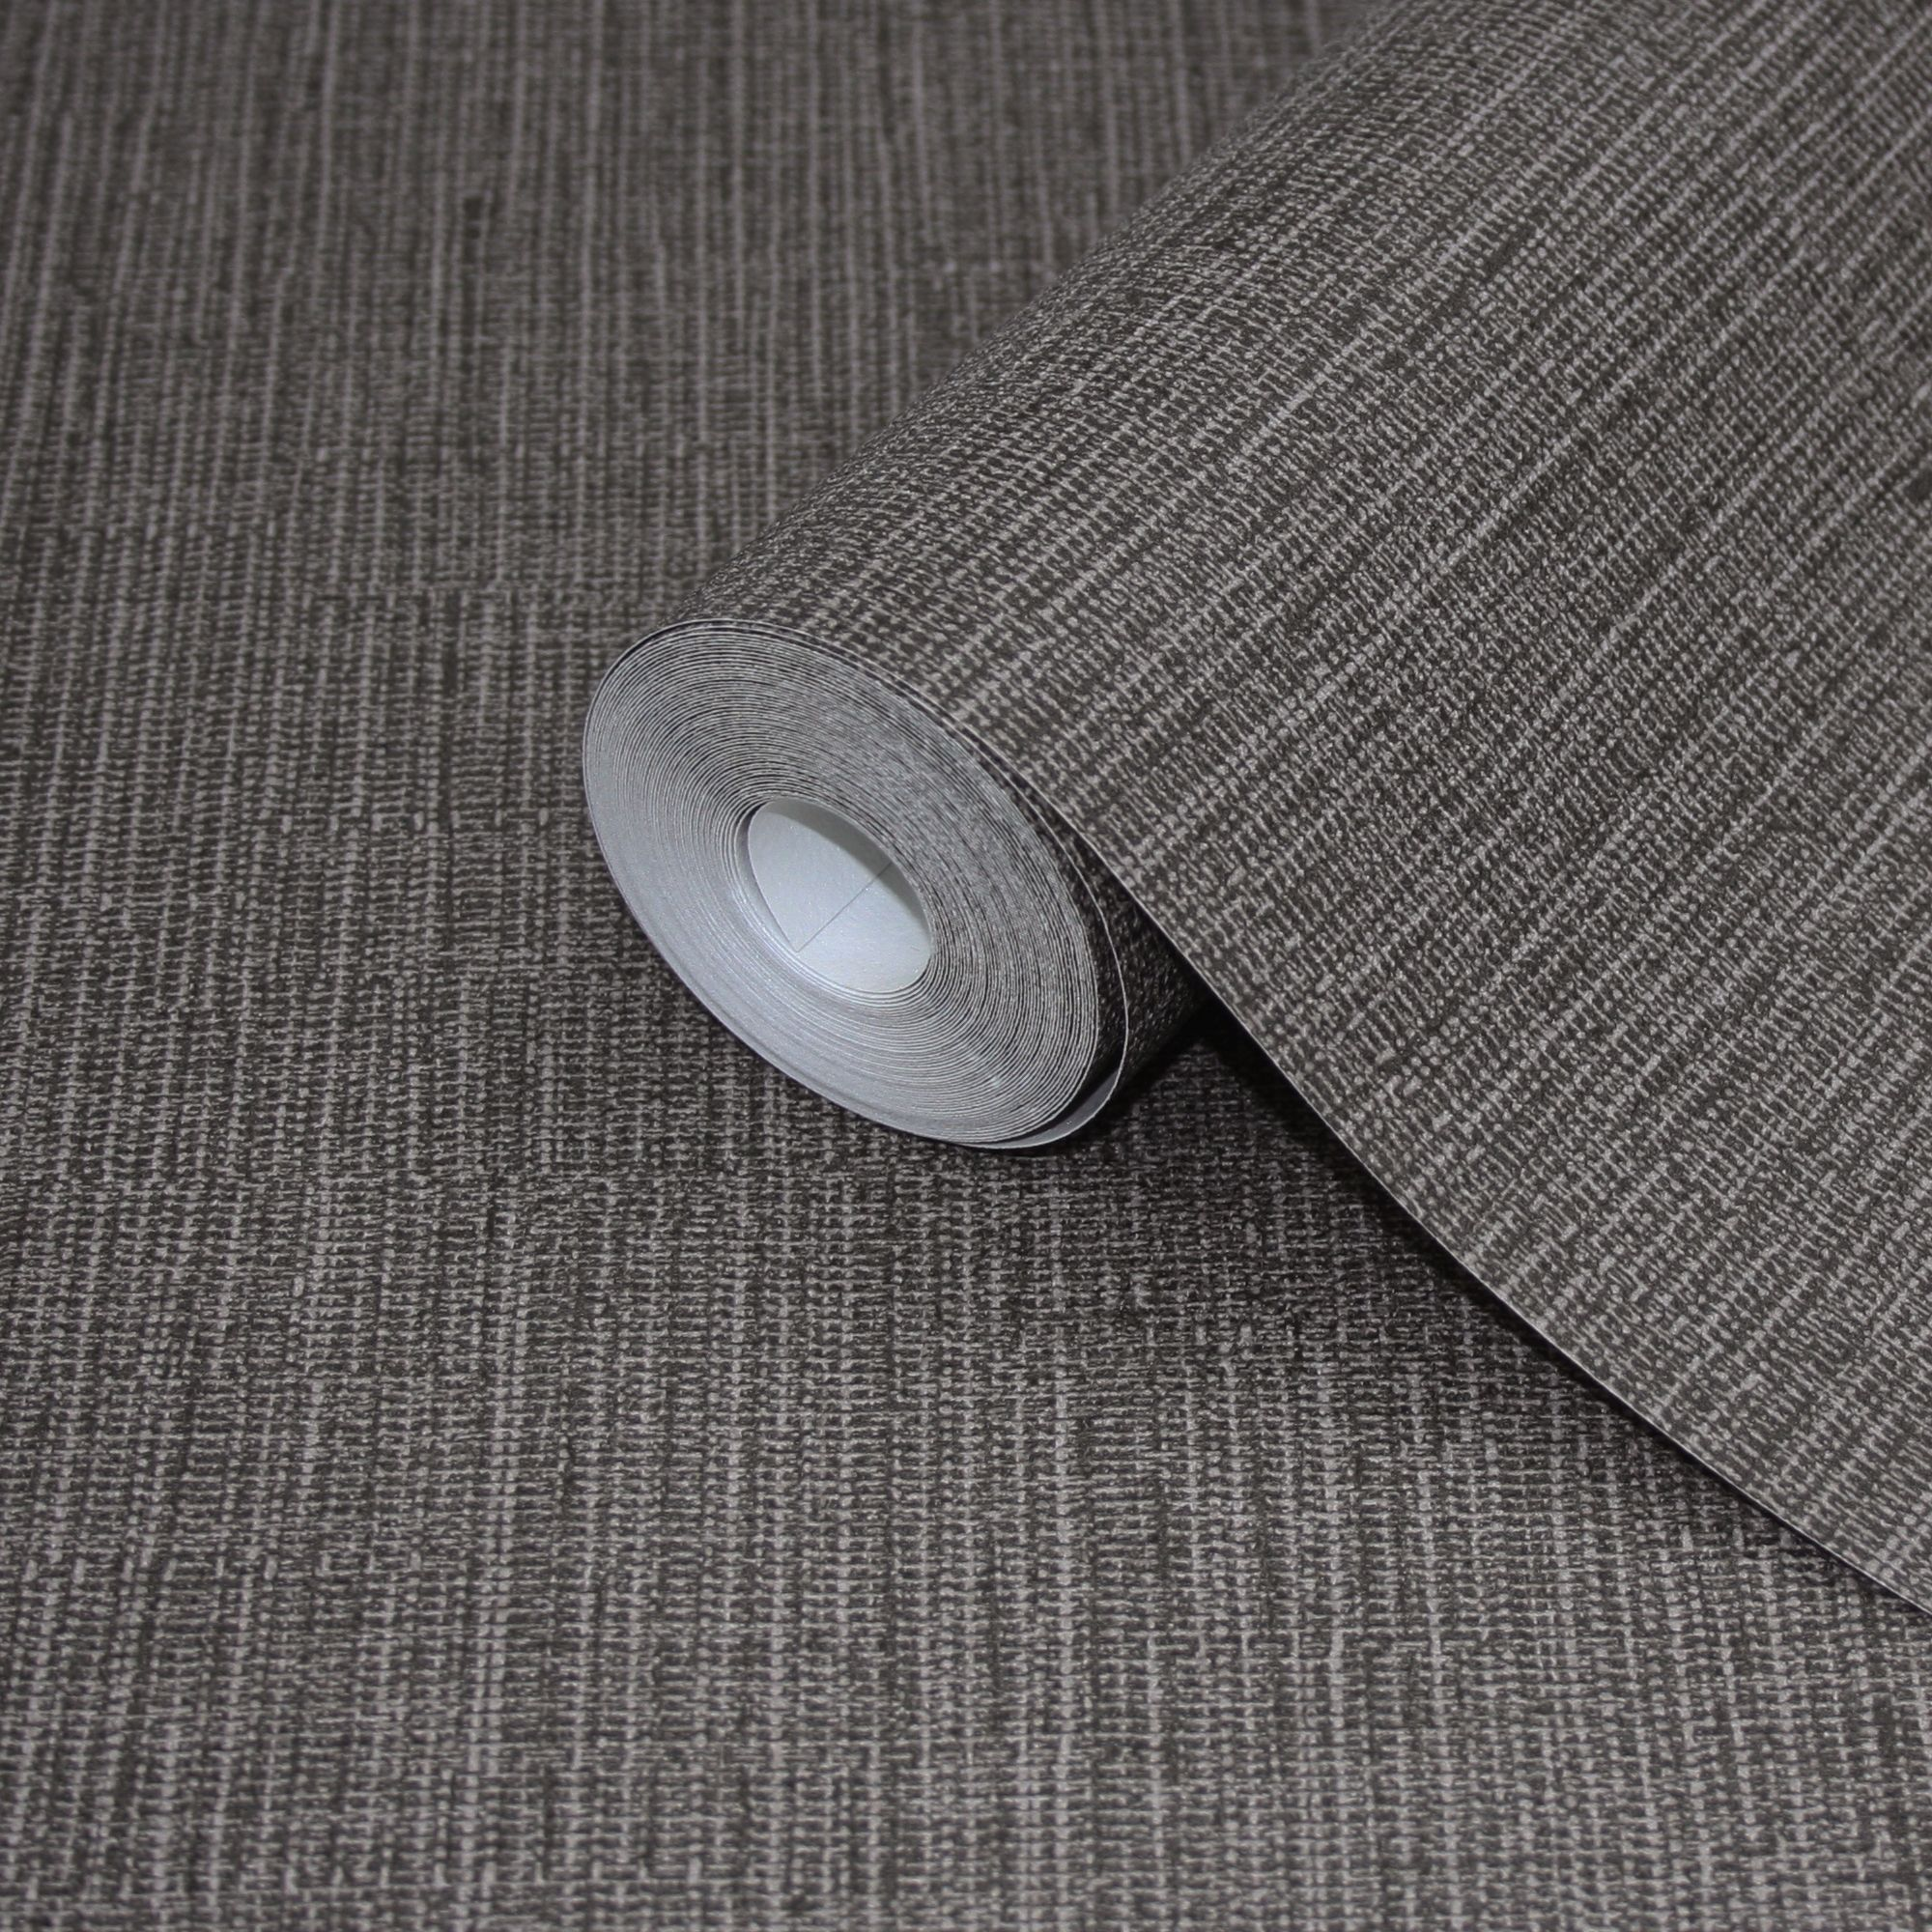 lutece plain black taupe fabric tweed effect wallpaper. Black Bedroom Furniture Sets. Home Design Ideas